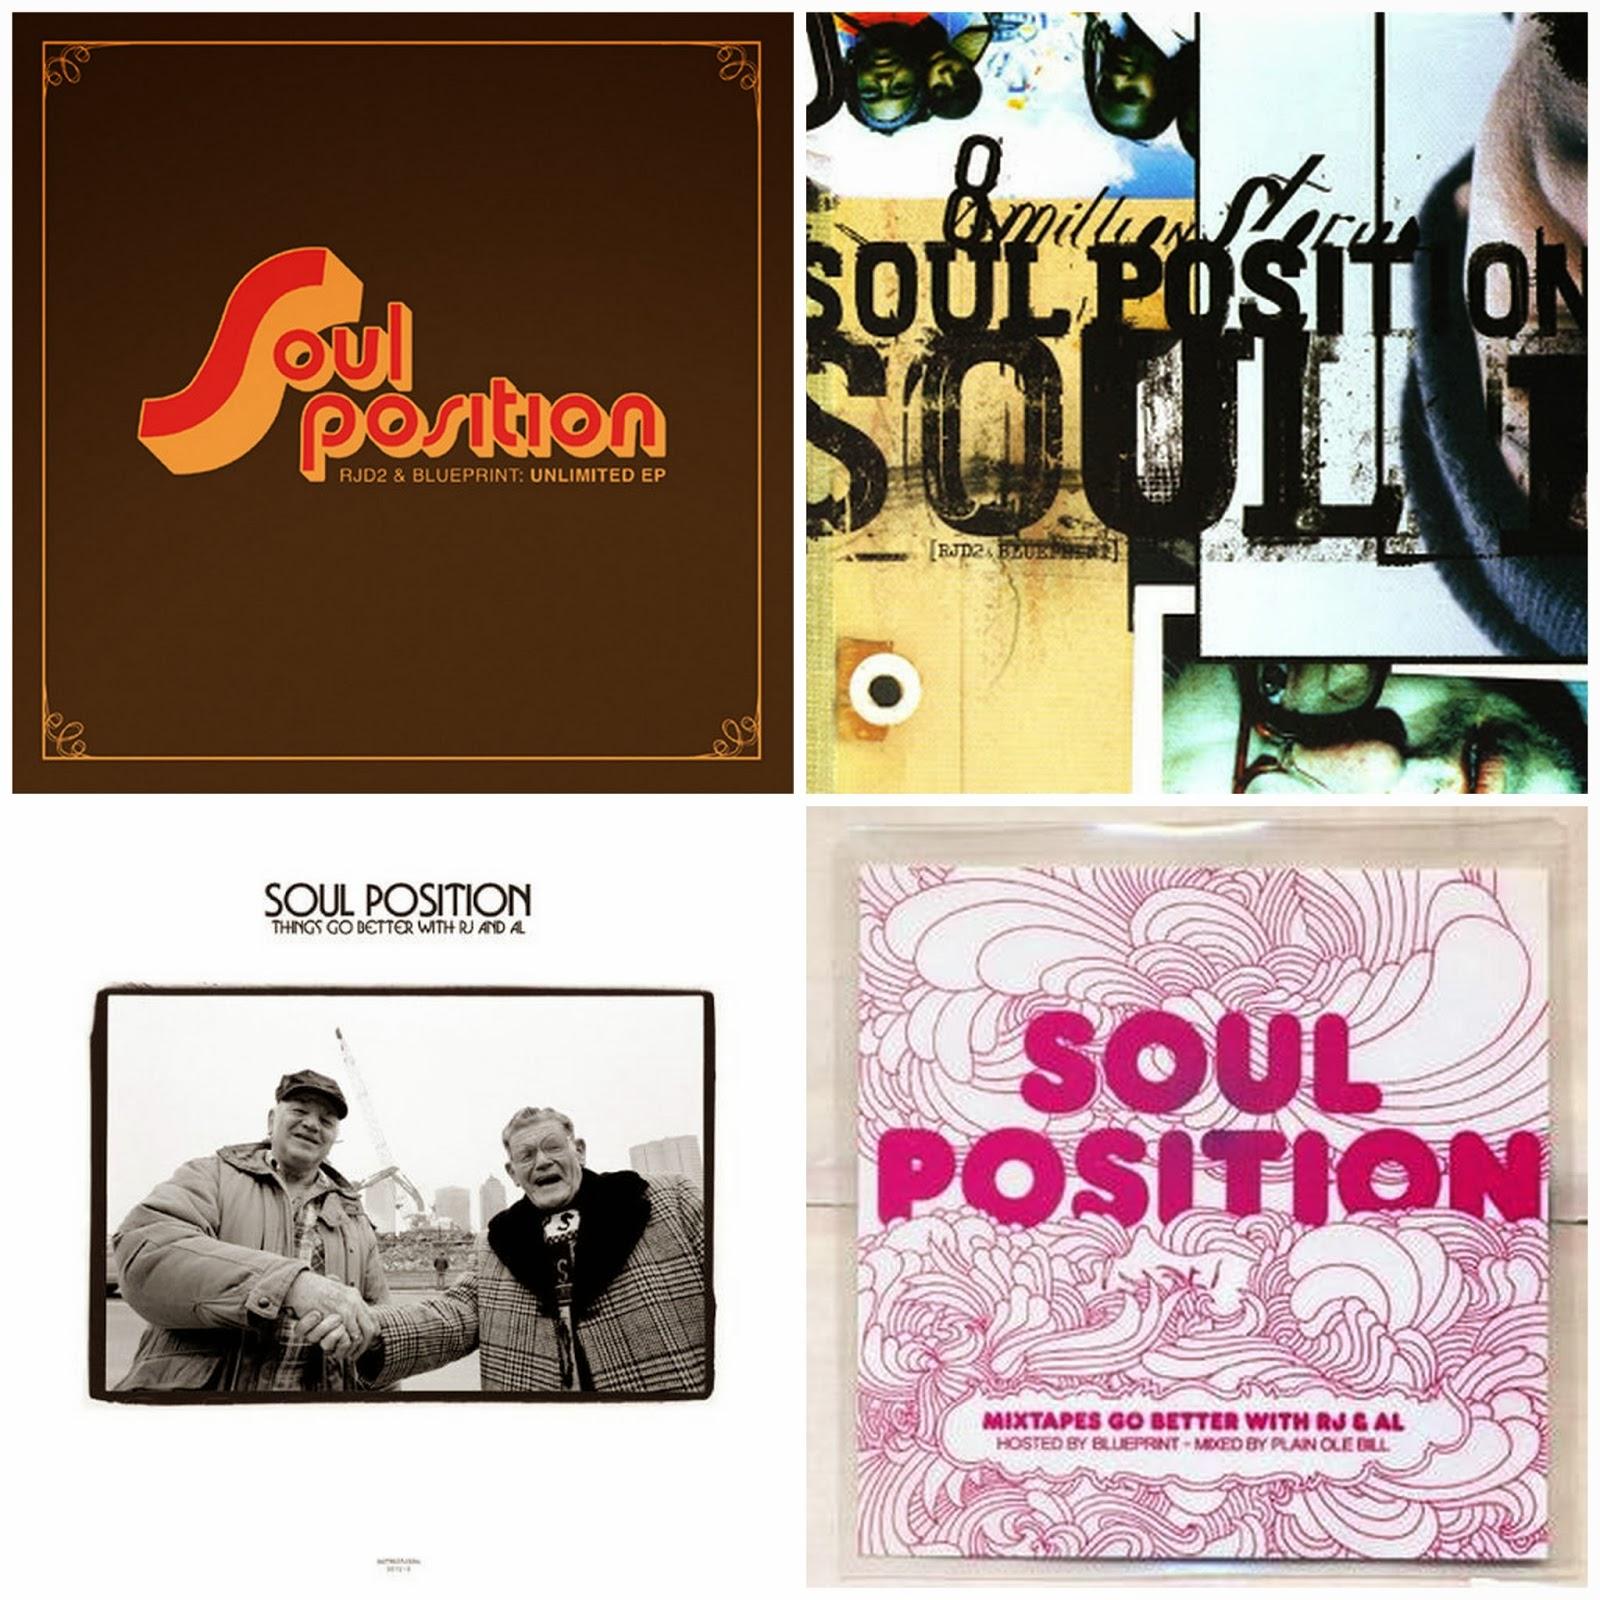 Soul position discografa mediafire 2002 2006 producto ilcito domingo 25 de mayo de 2014 malvernweather Gallery